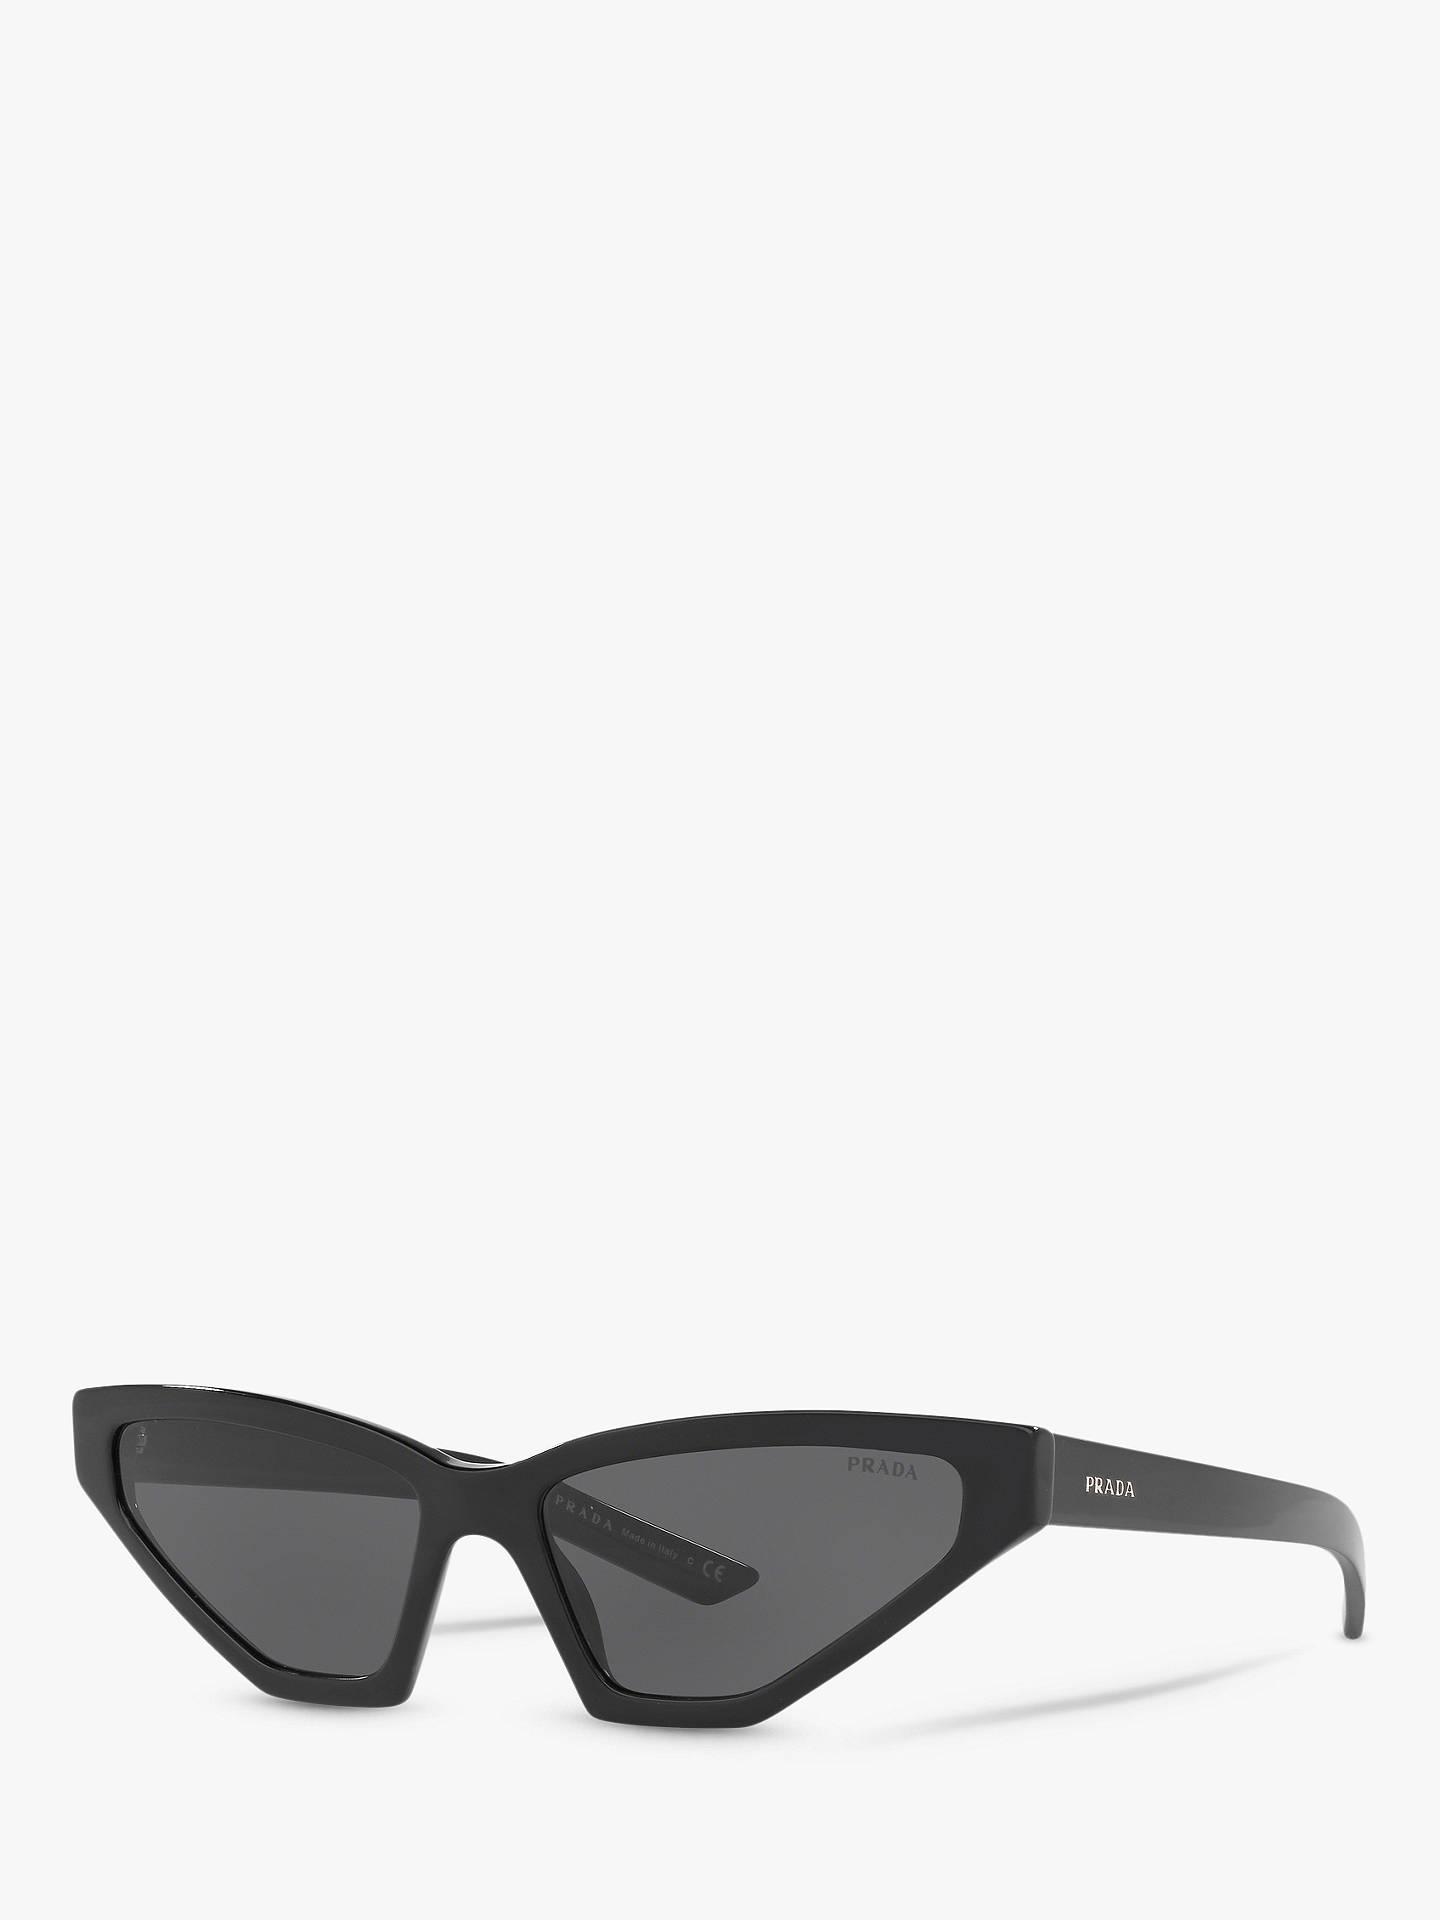 22e51455ff9d Prada PR 12VS Women s Cat s Eye Sunglasses at John Lewis   Partners